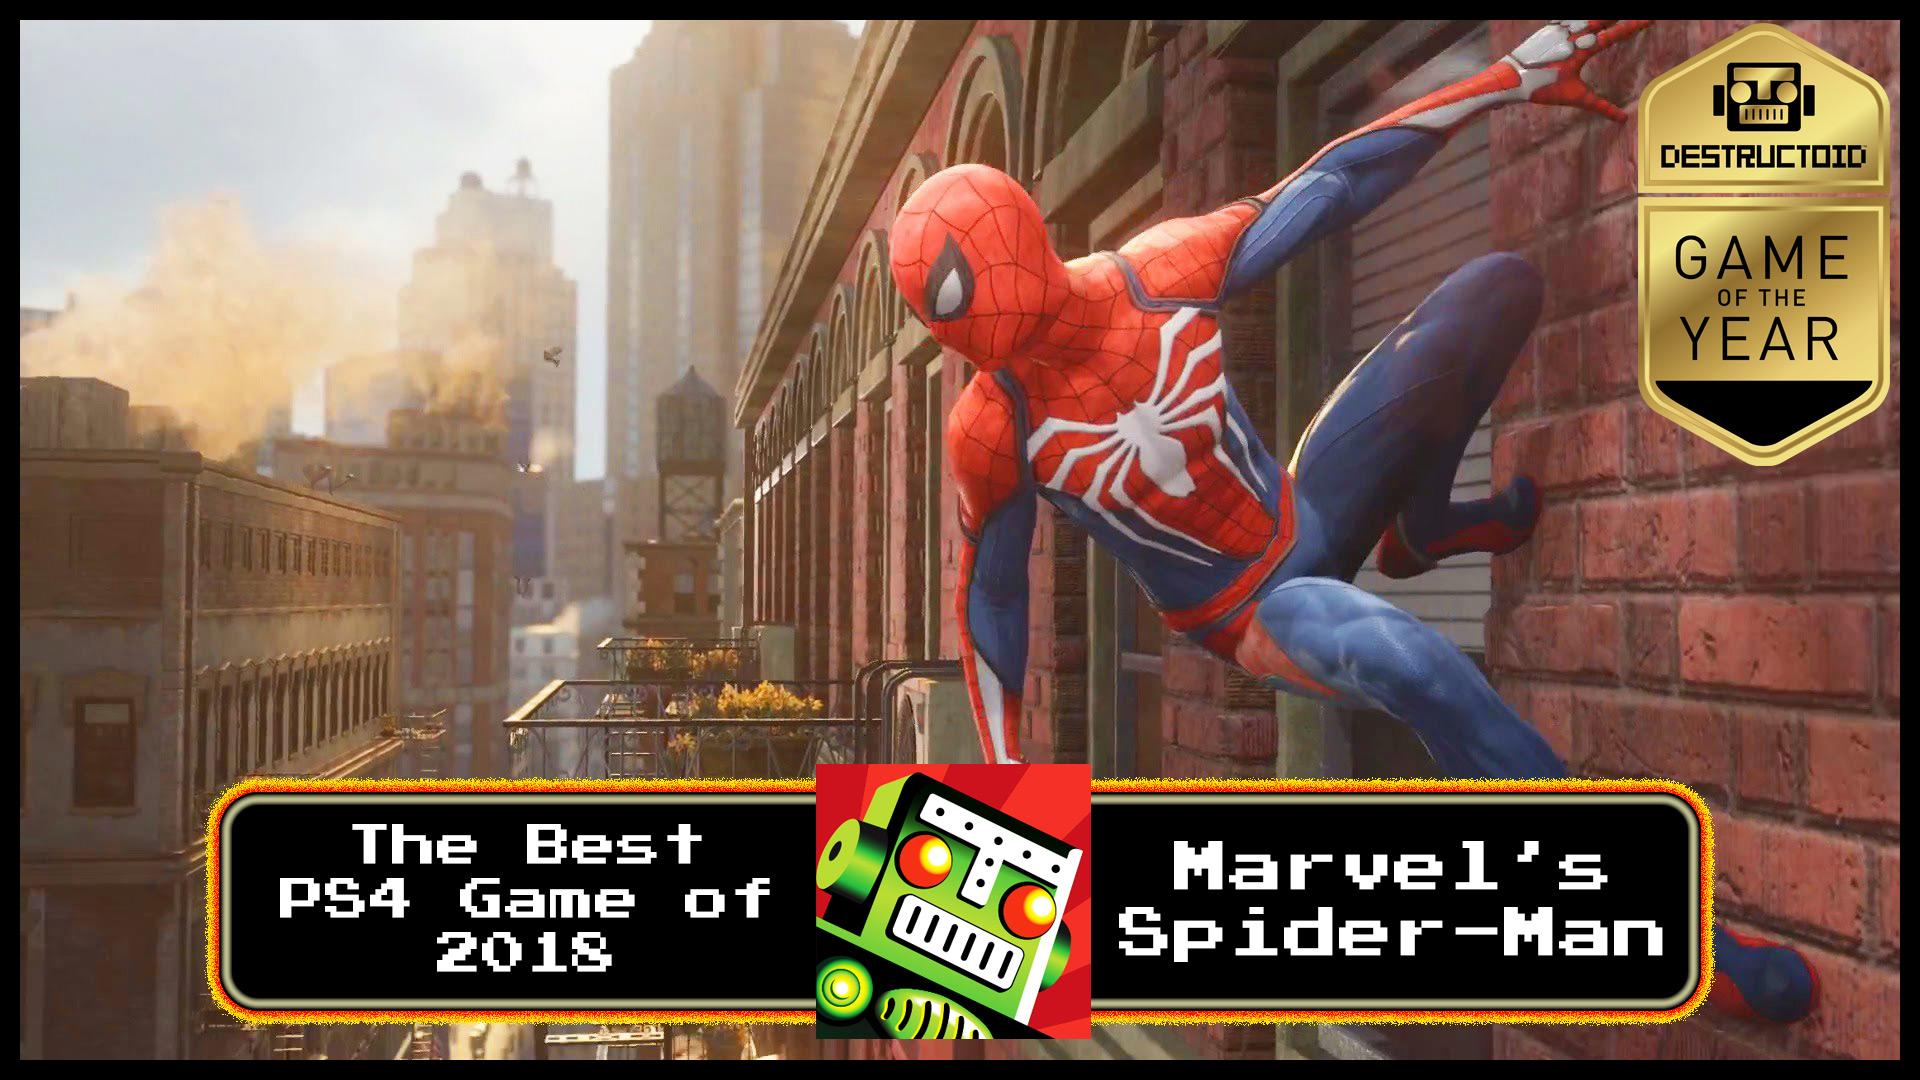 Spider-Man is Destructoid's Best PS4 Game of 2018